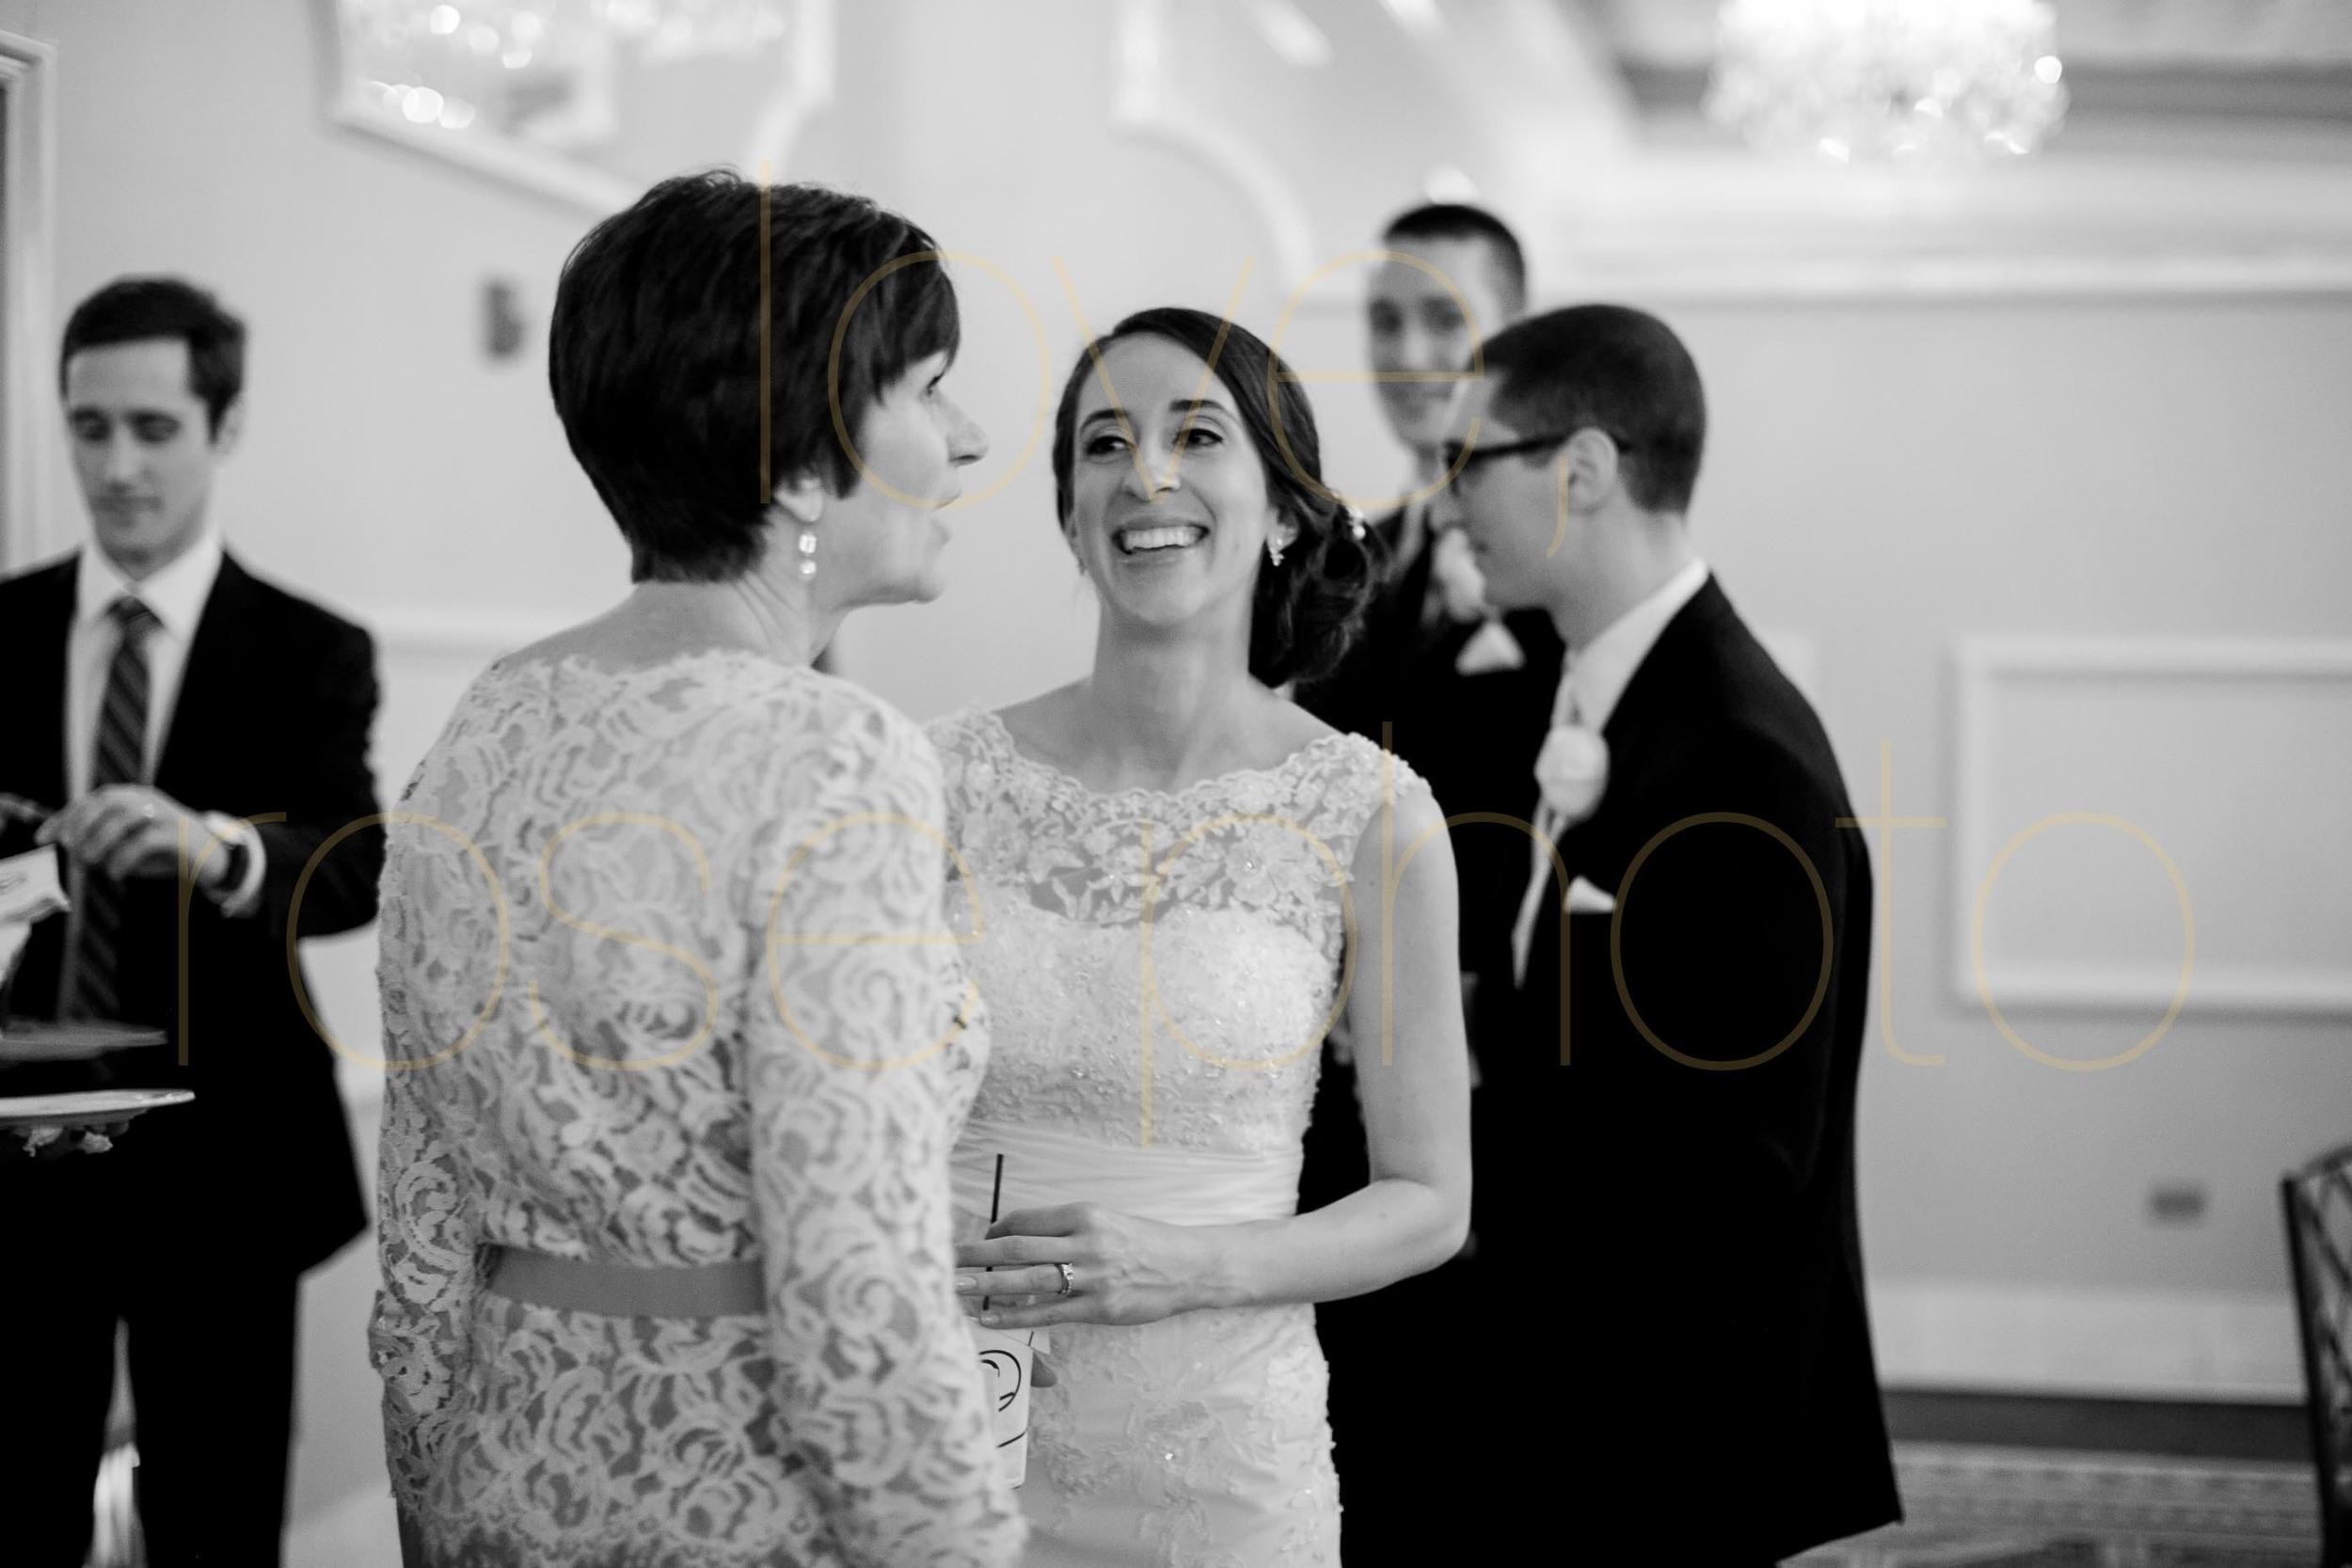 K Bianci maple chaple summer wedding chicago photographer -0357.jpg